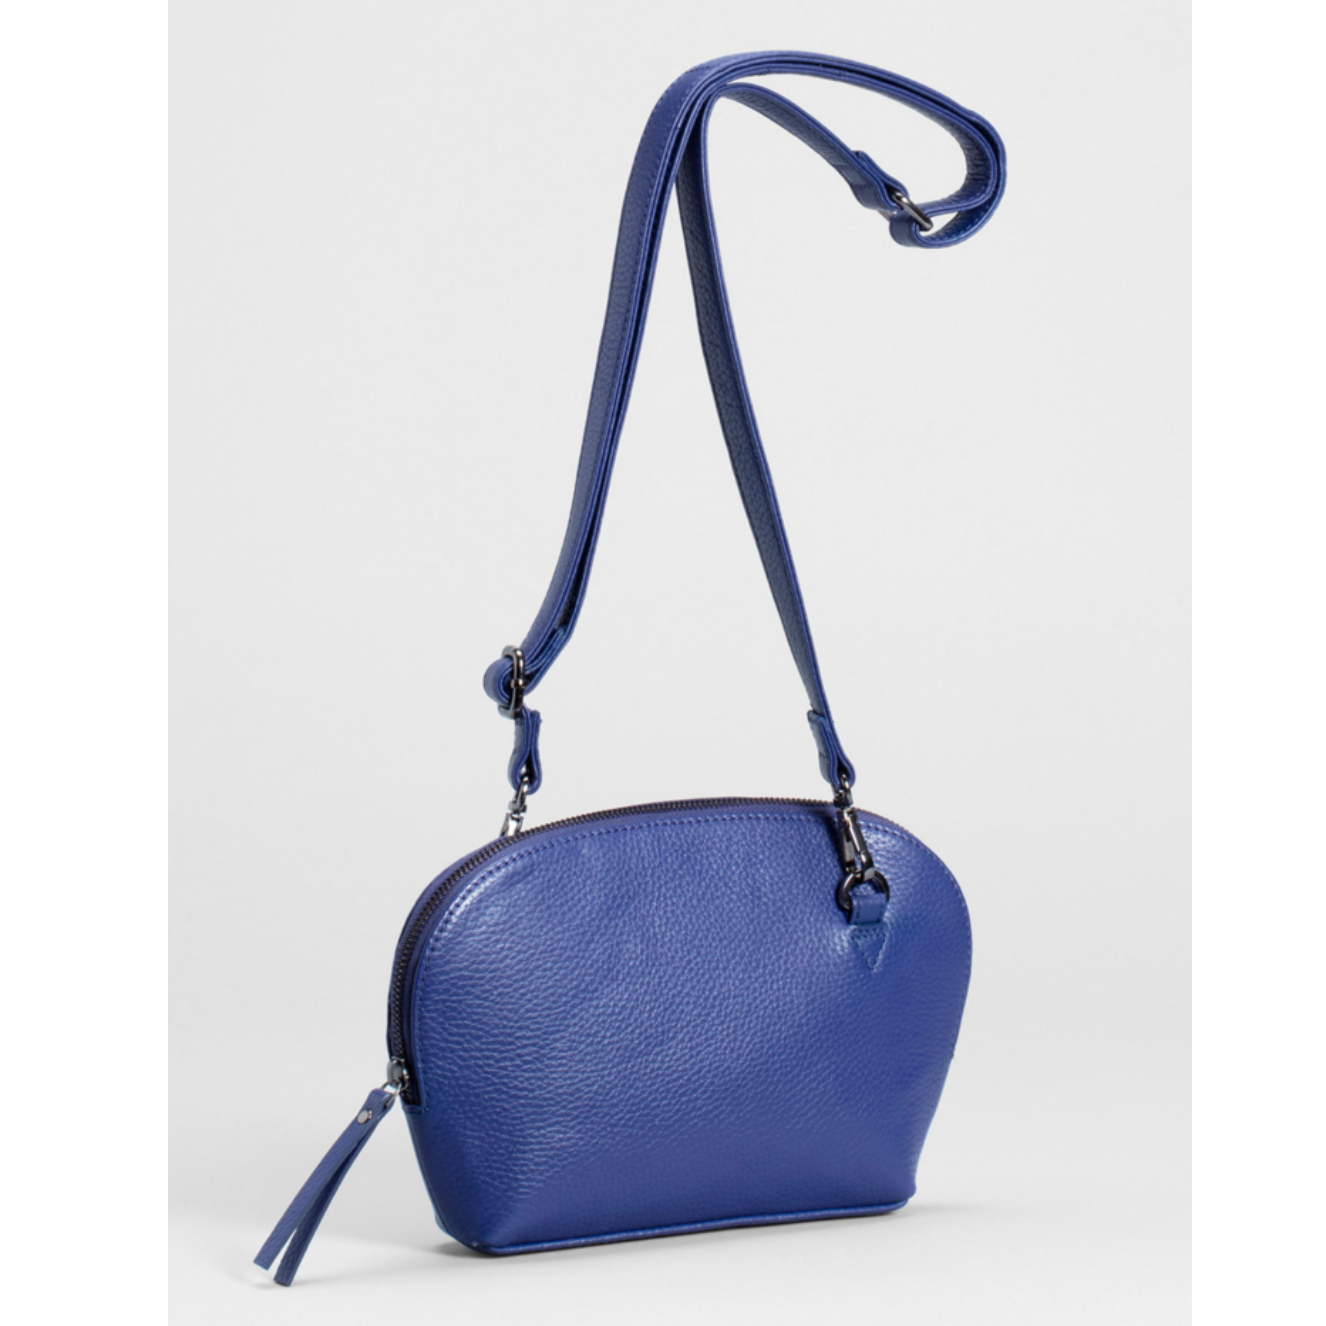 Lotte Small Bag - Iris Blue